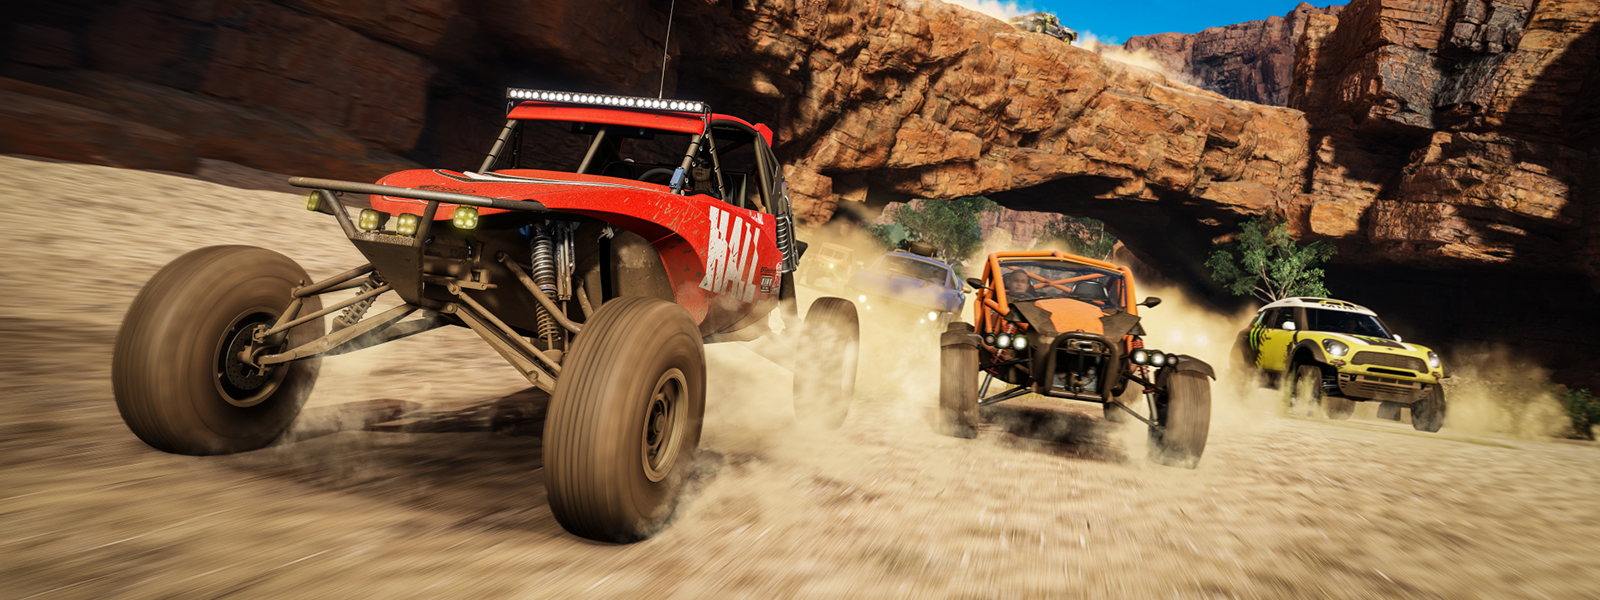 Forza screenshot of three cars racing